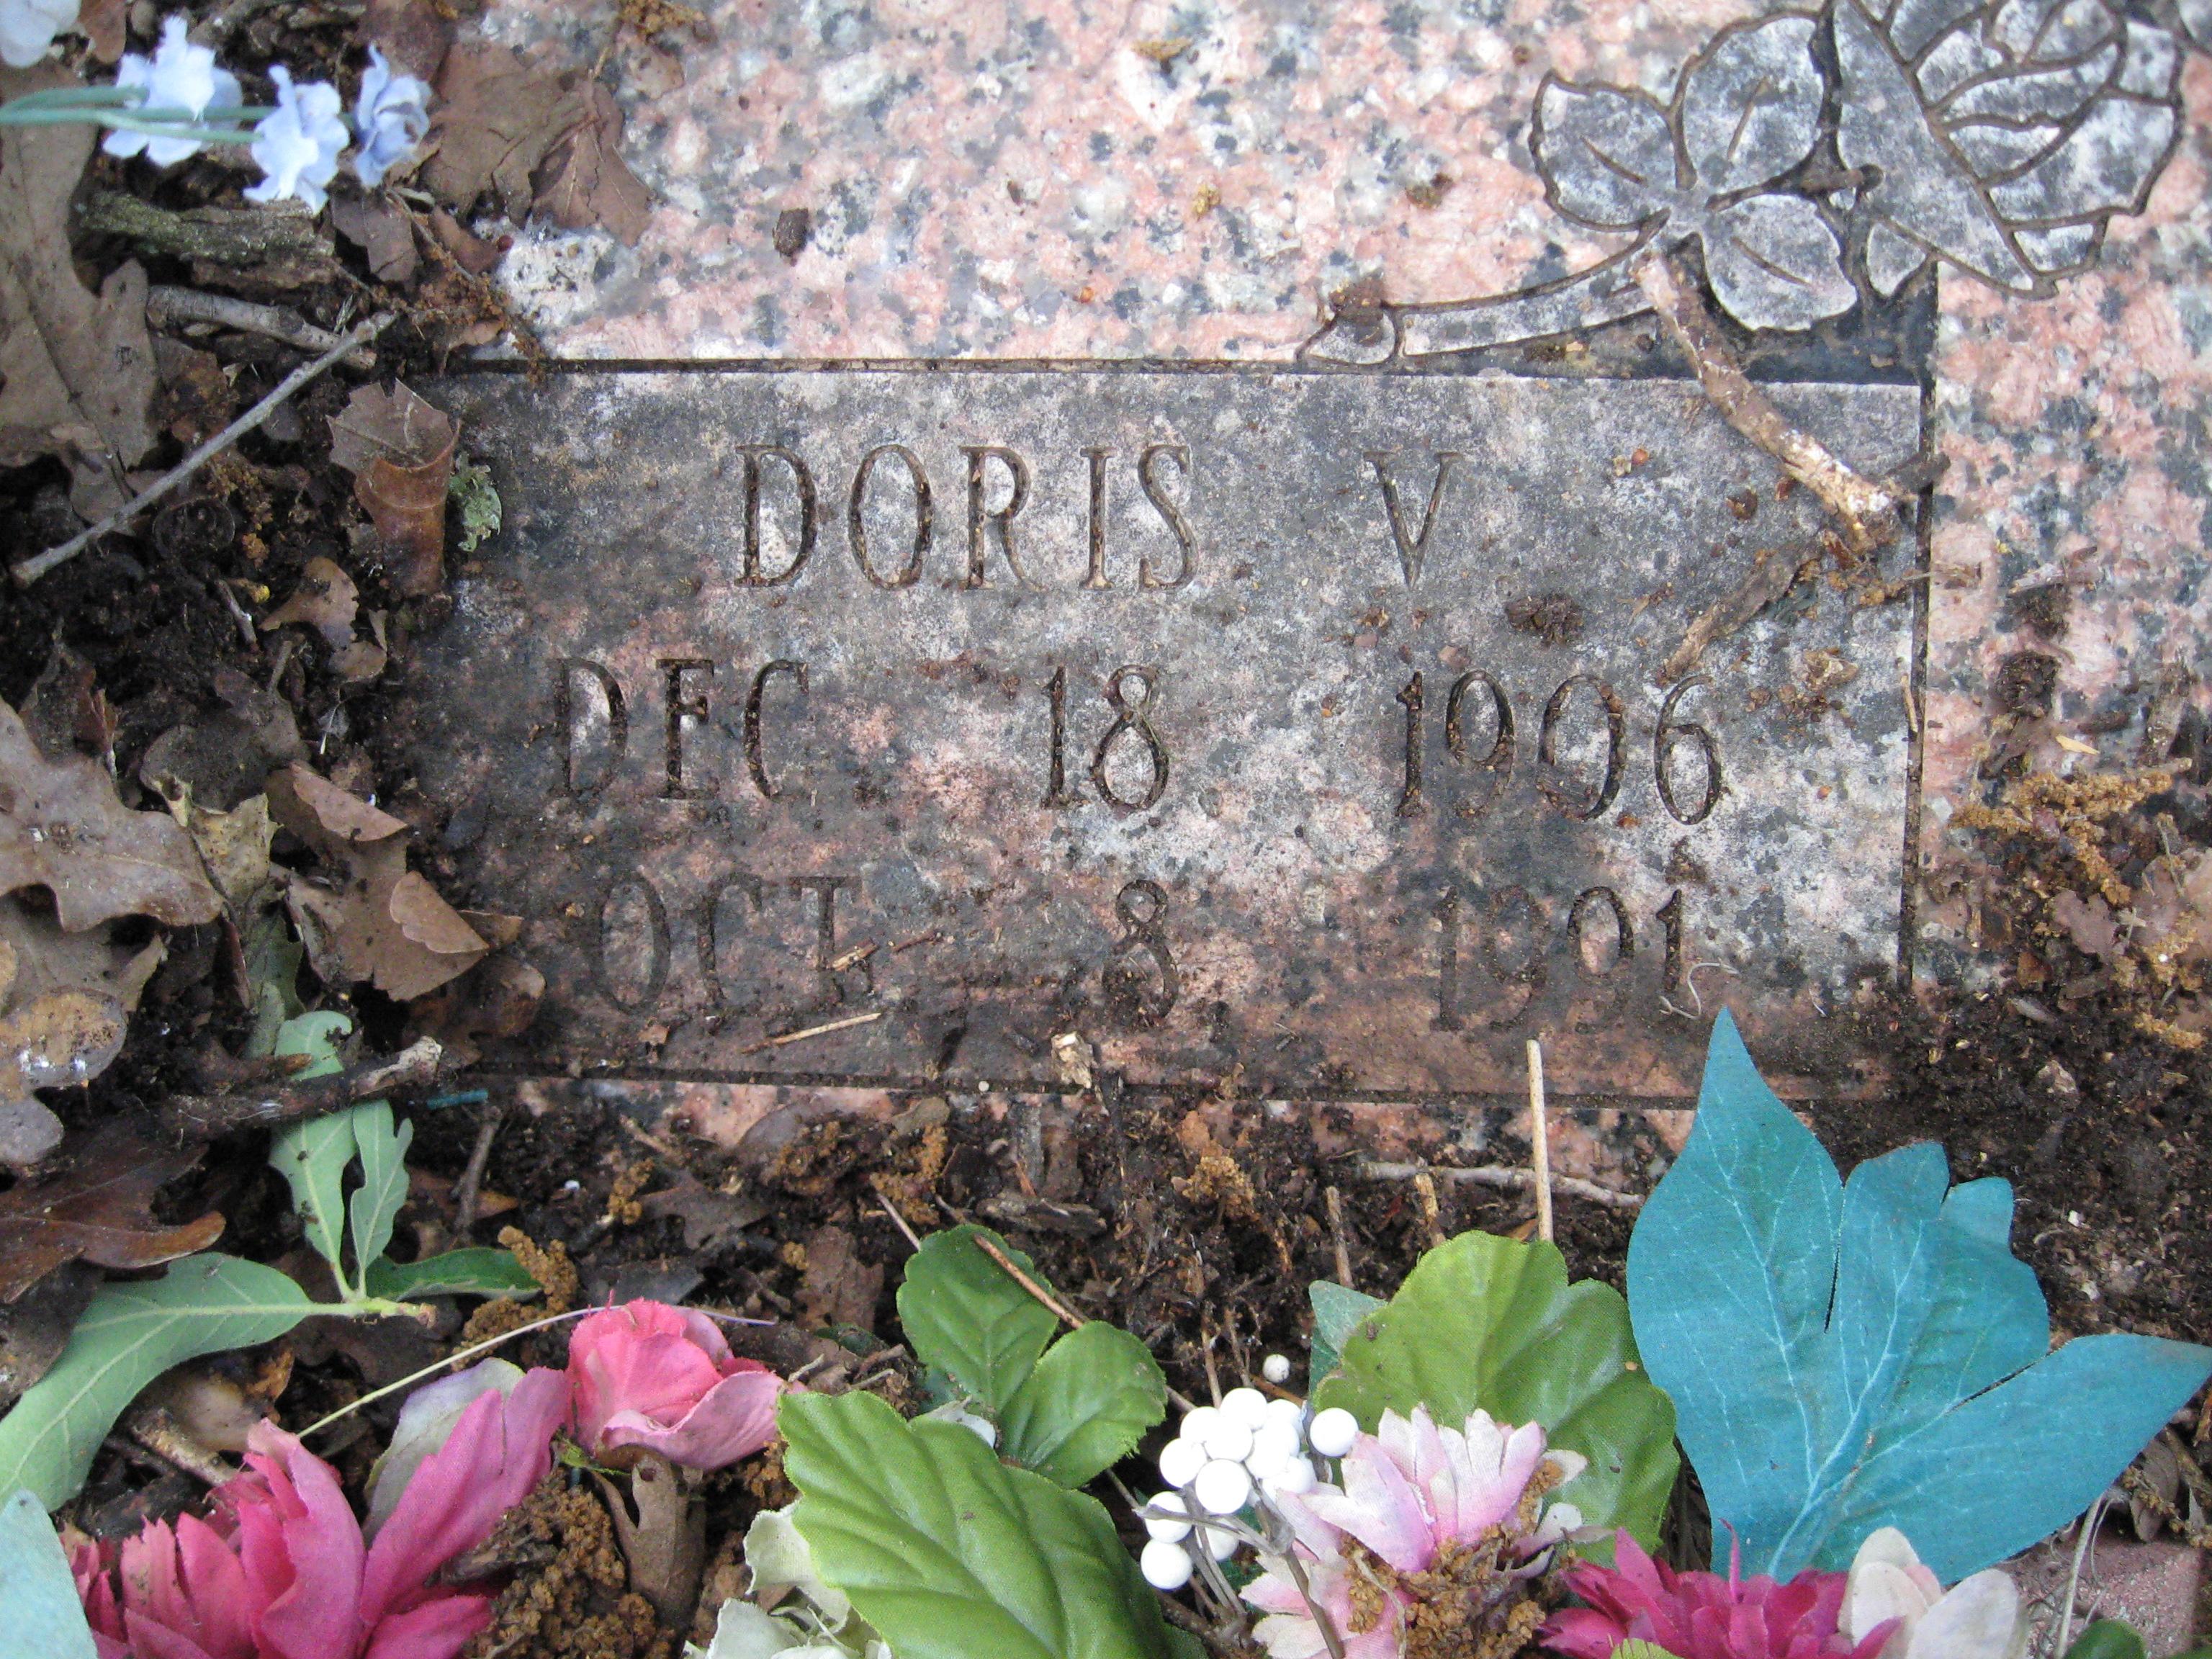 Doris Singletary